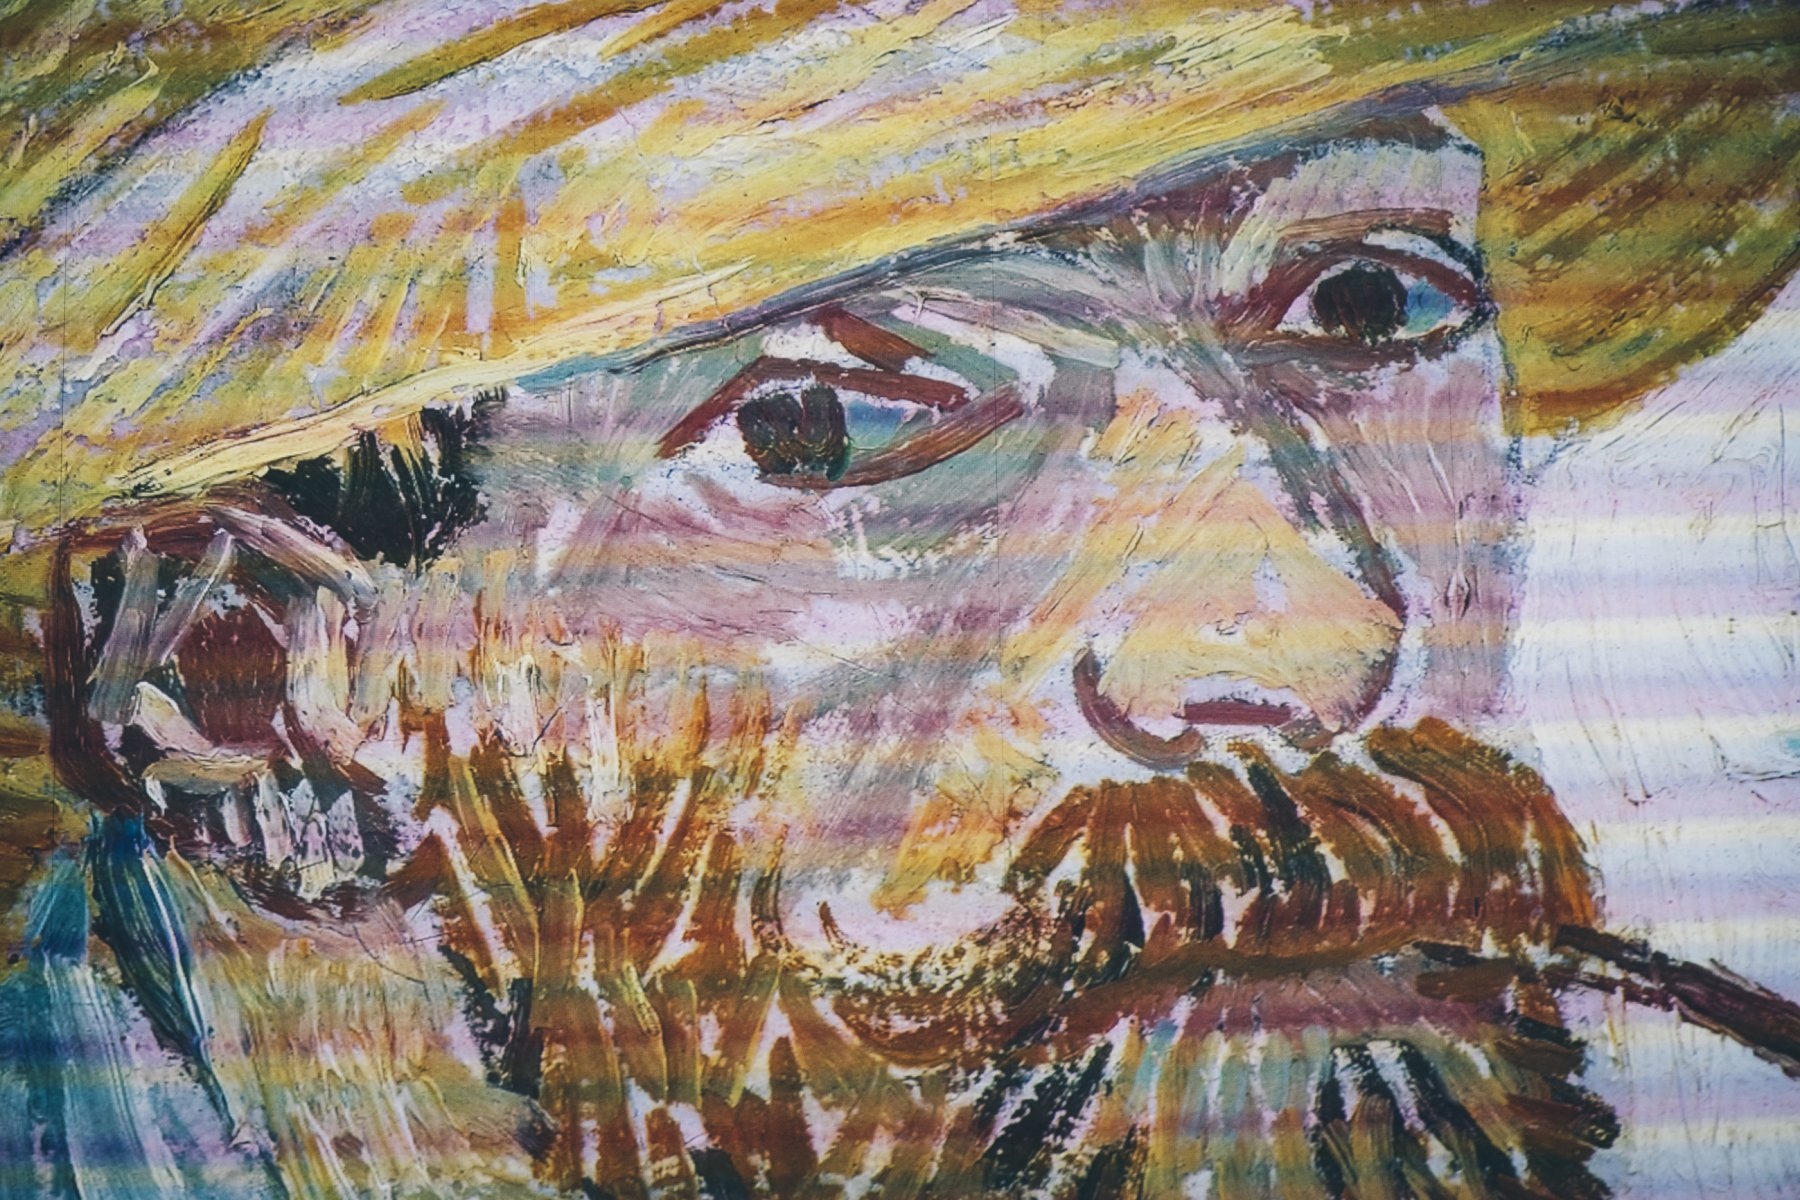 Van Gogh Alive 6292 – ©wunderland media GmbH